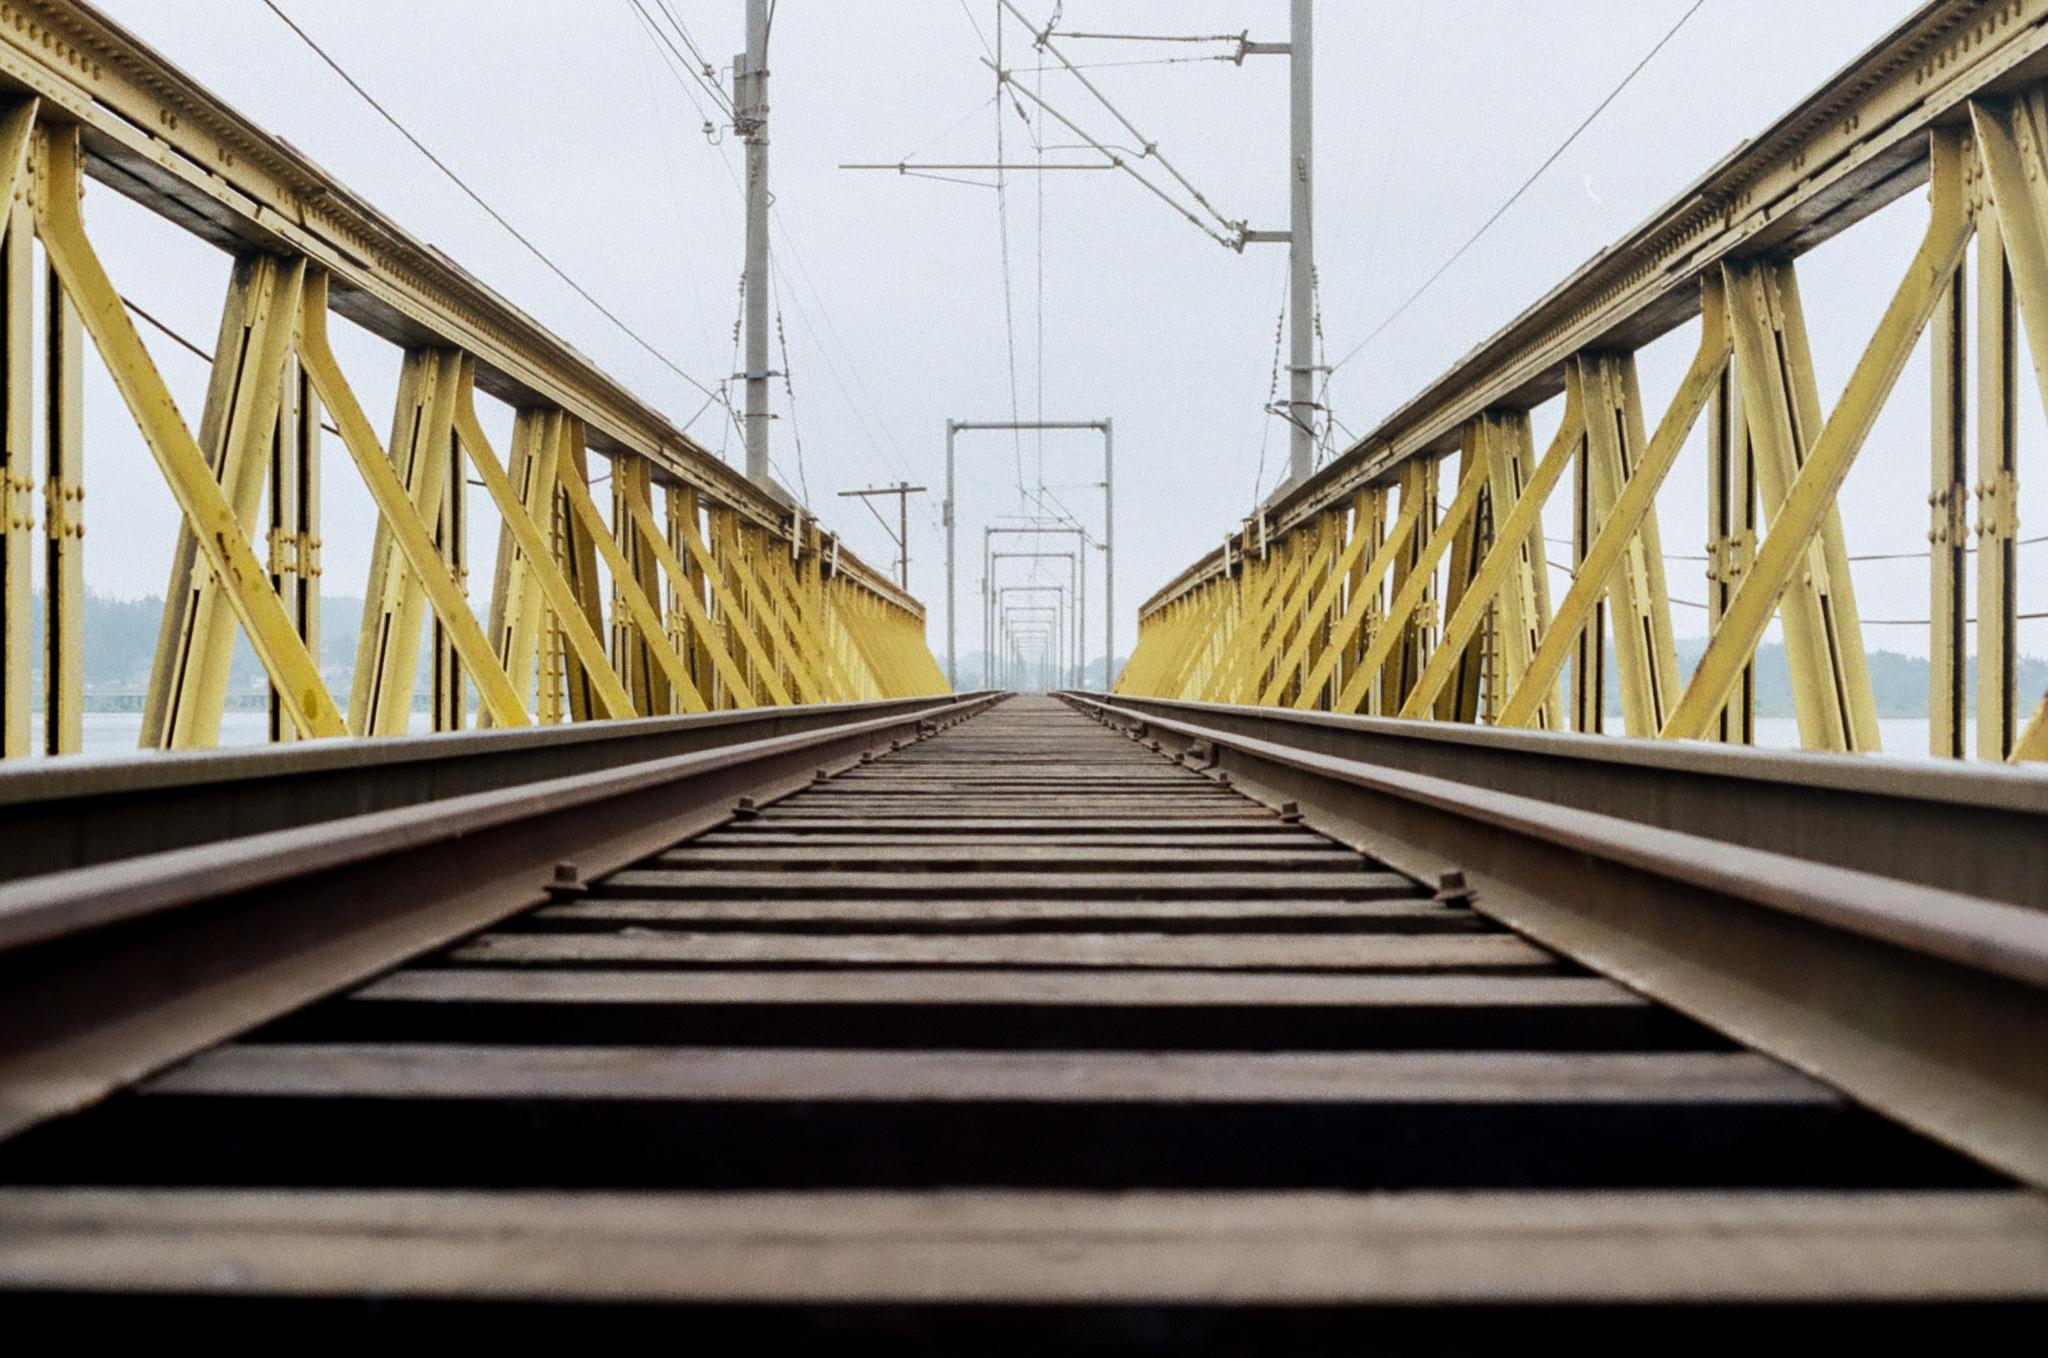 Railroad by Anibal Aguillon Salazar